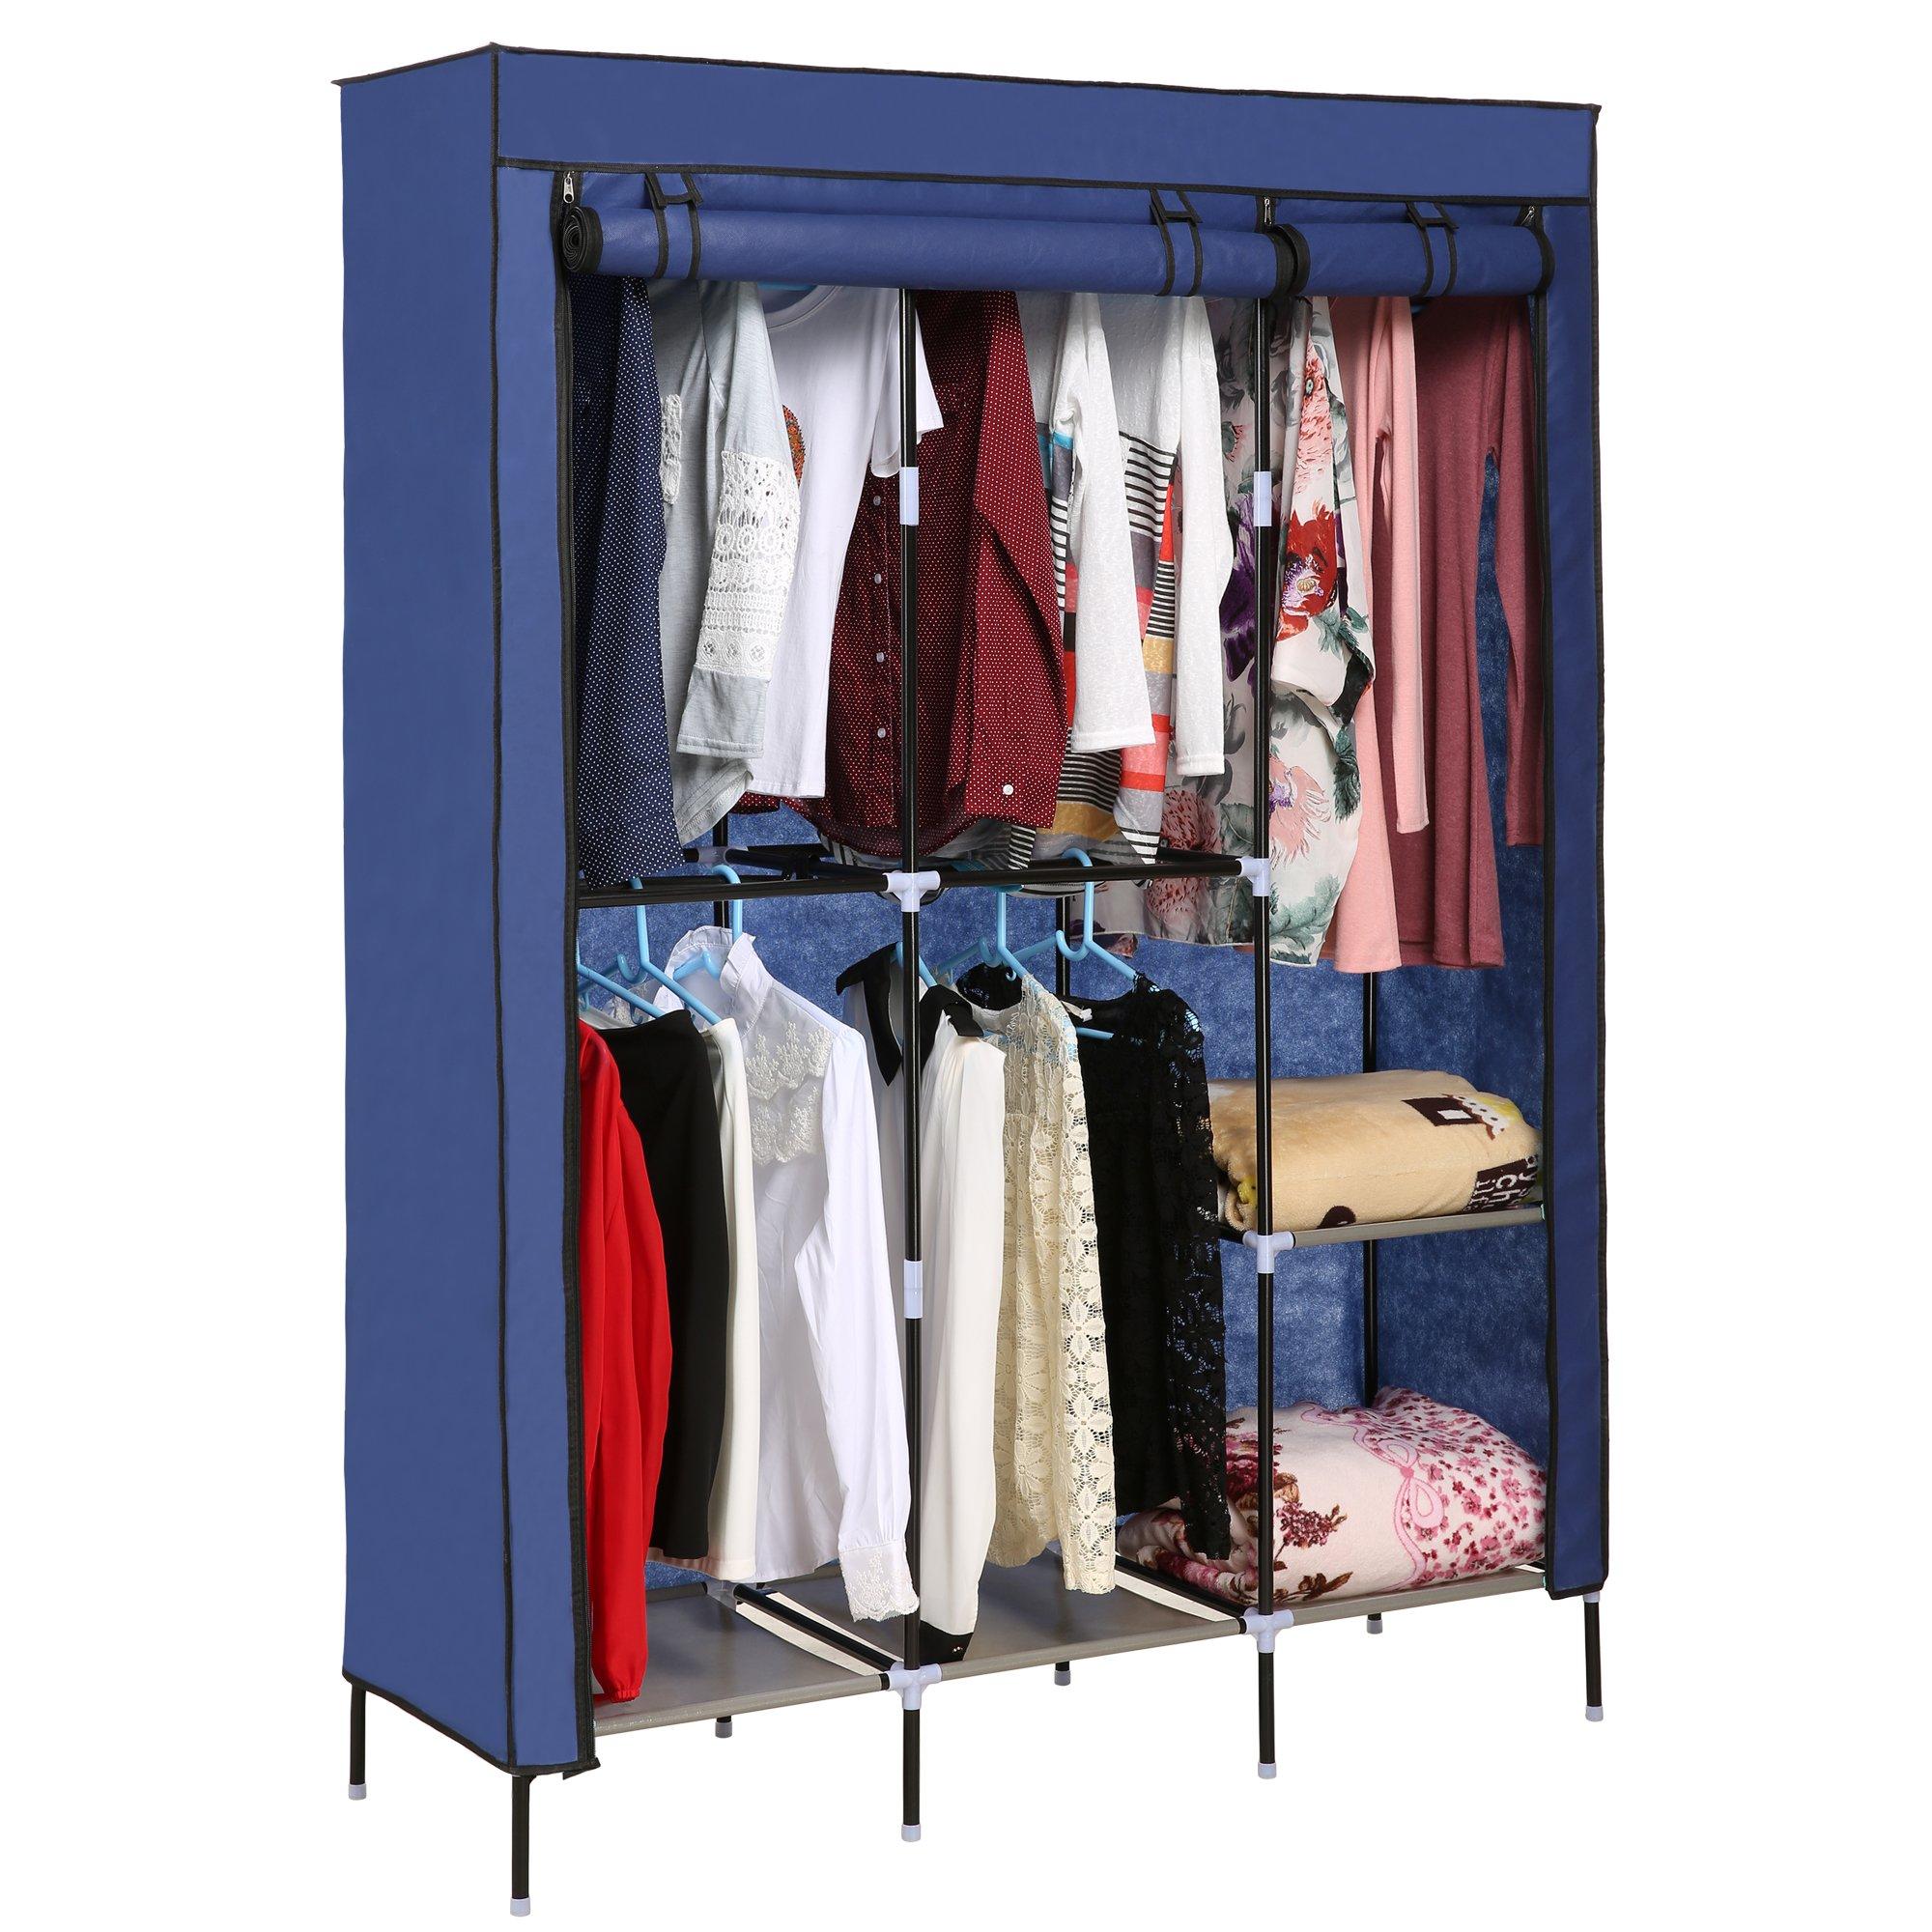 Dorfin Storage Organizer Wardrobe Clothing Closet Freestanding Double Rod Non-woven Fabric Organizer w/Shelves (Blue)